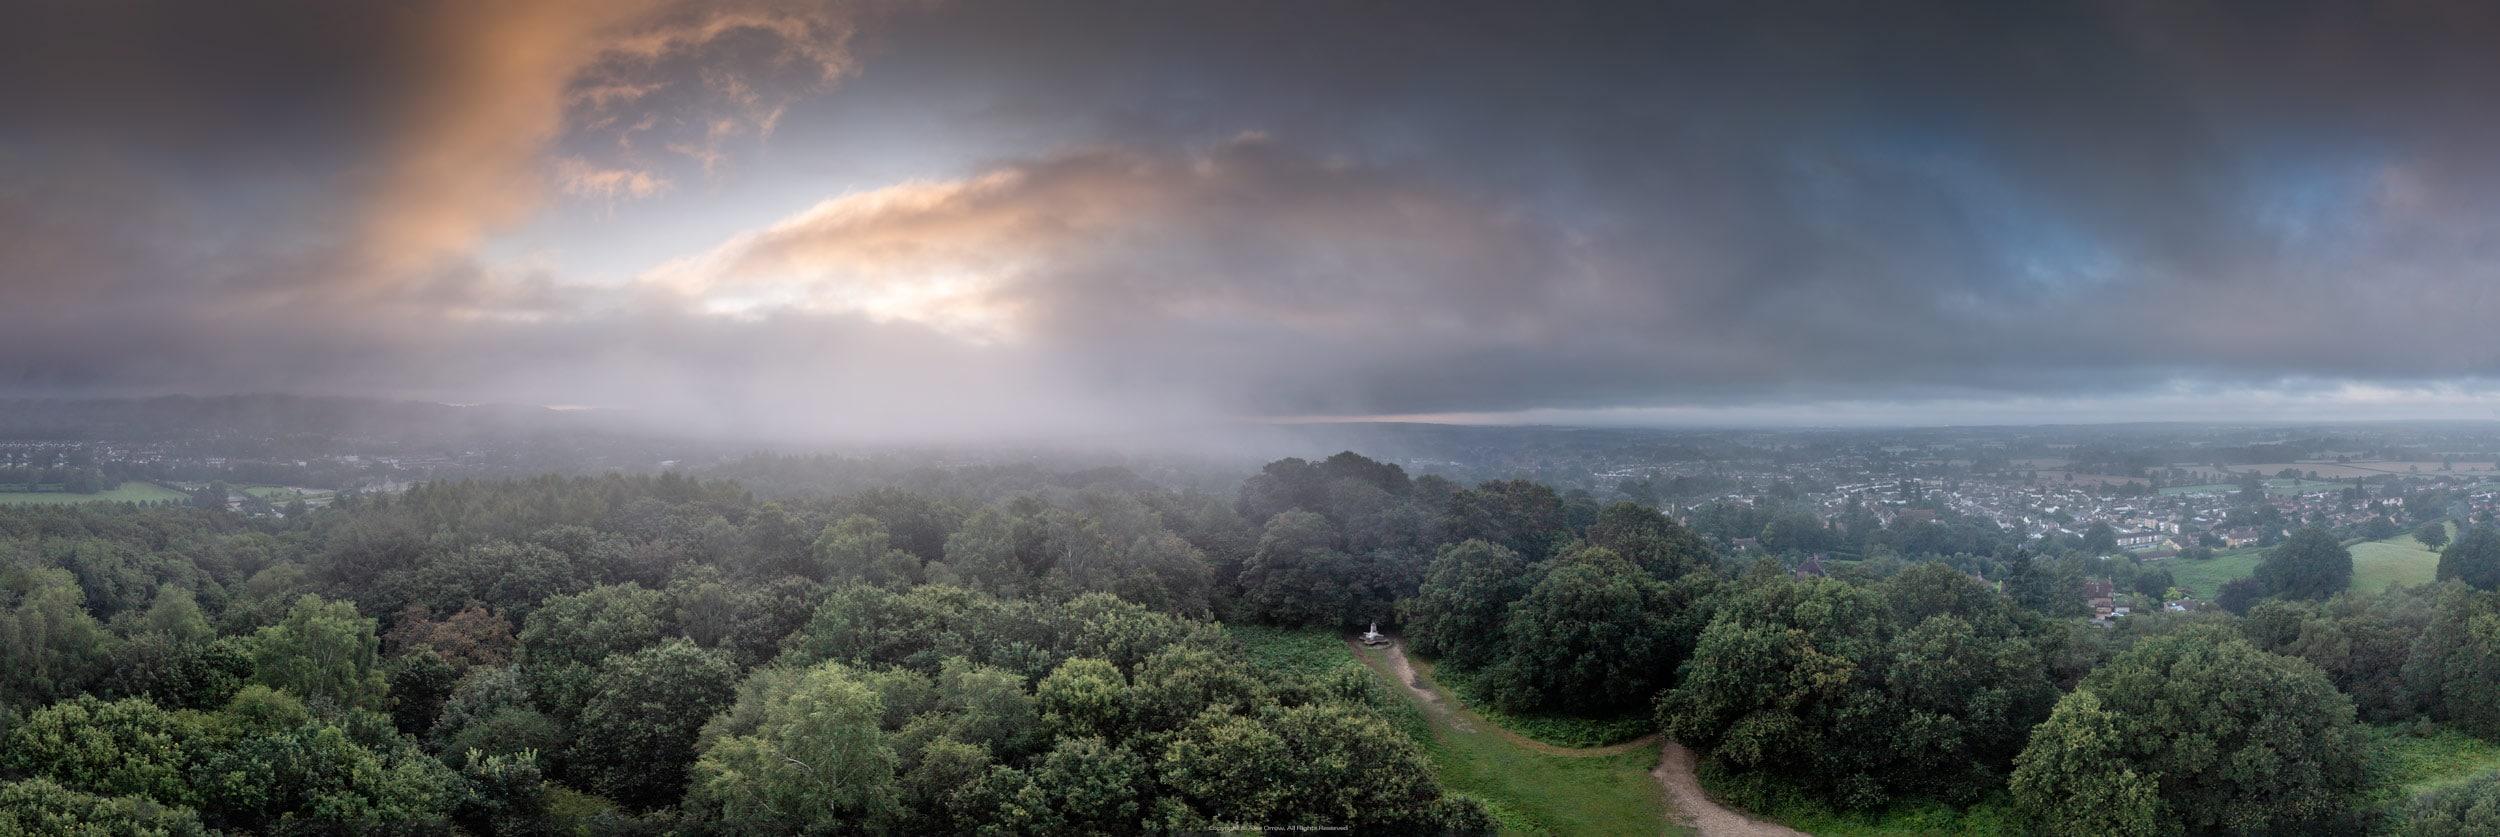 Drone Reigate Priory Park